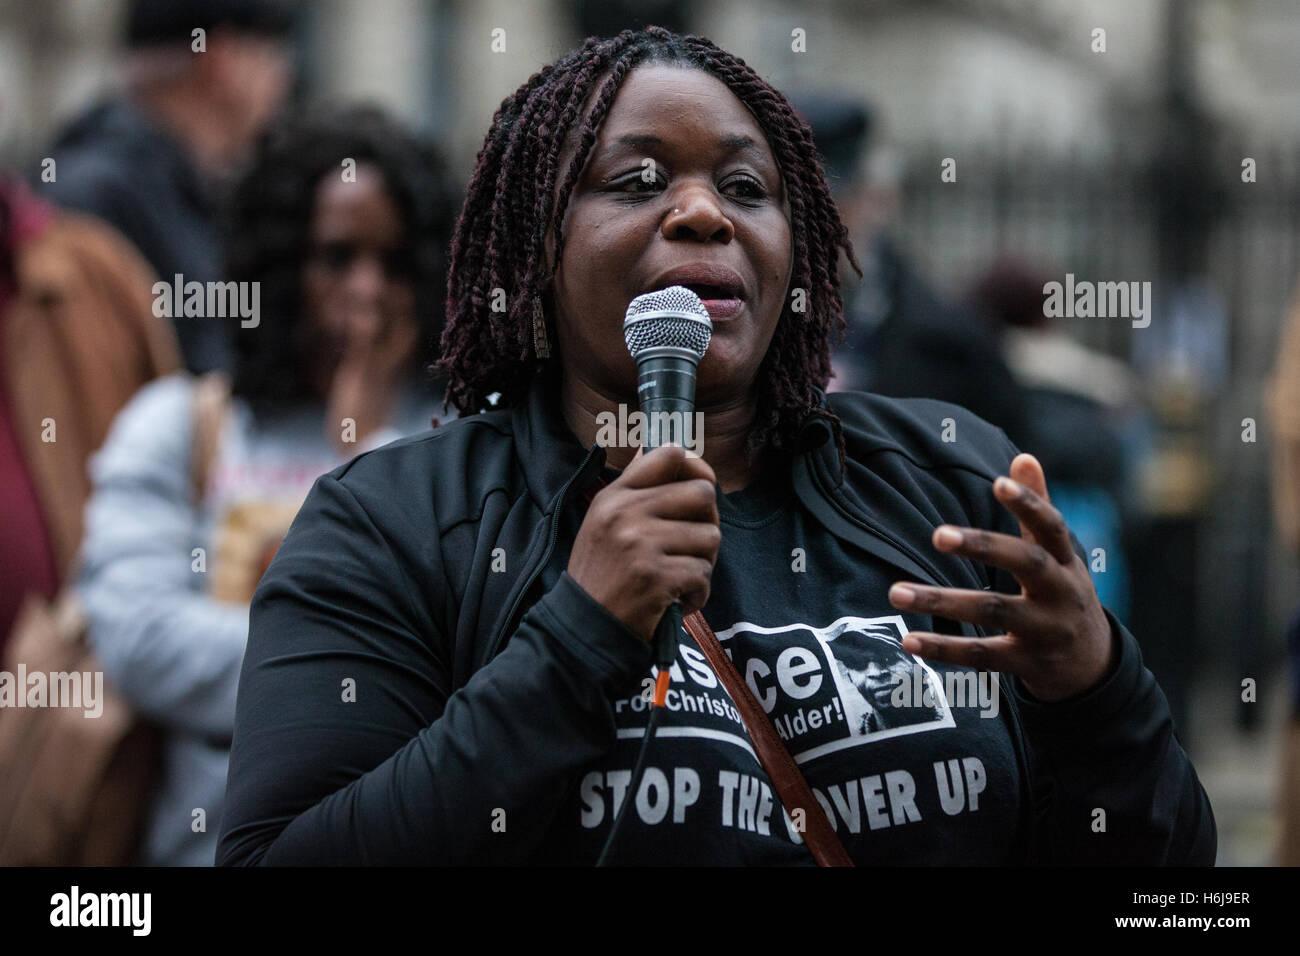 London, UK. 29th October, 2016. Janet Alder, sister of Christopher Alder, addresses campaigners from the United - Stock Image